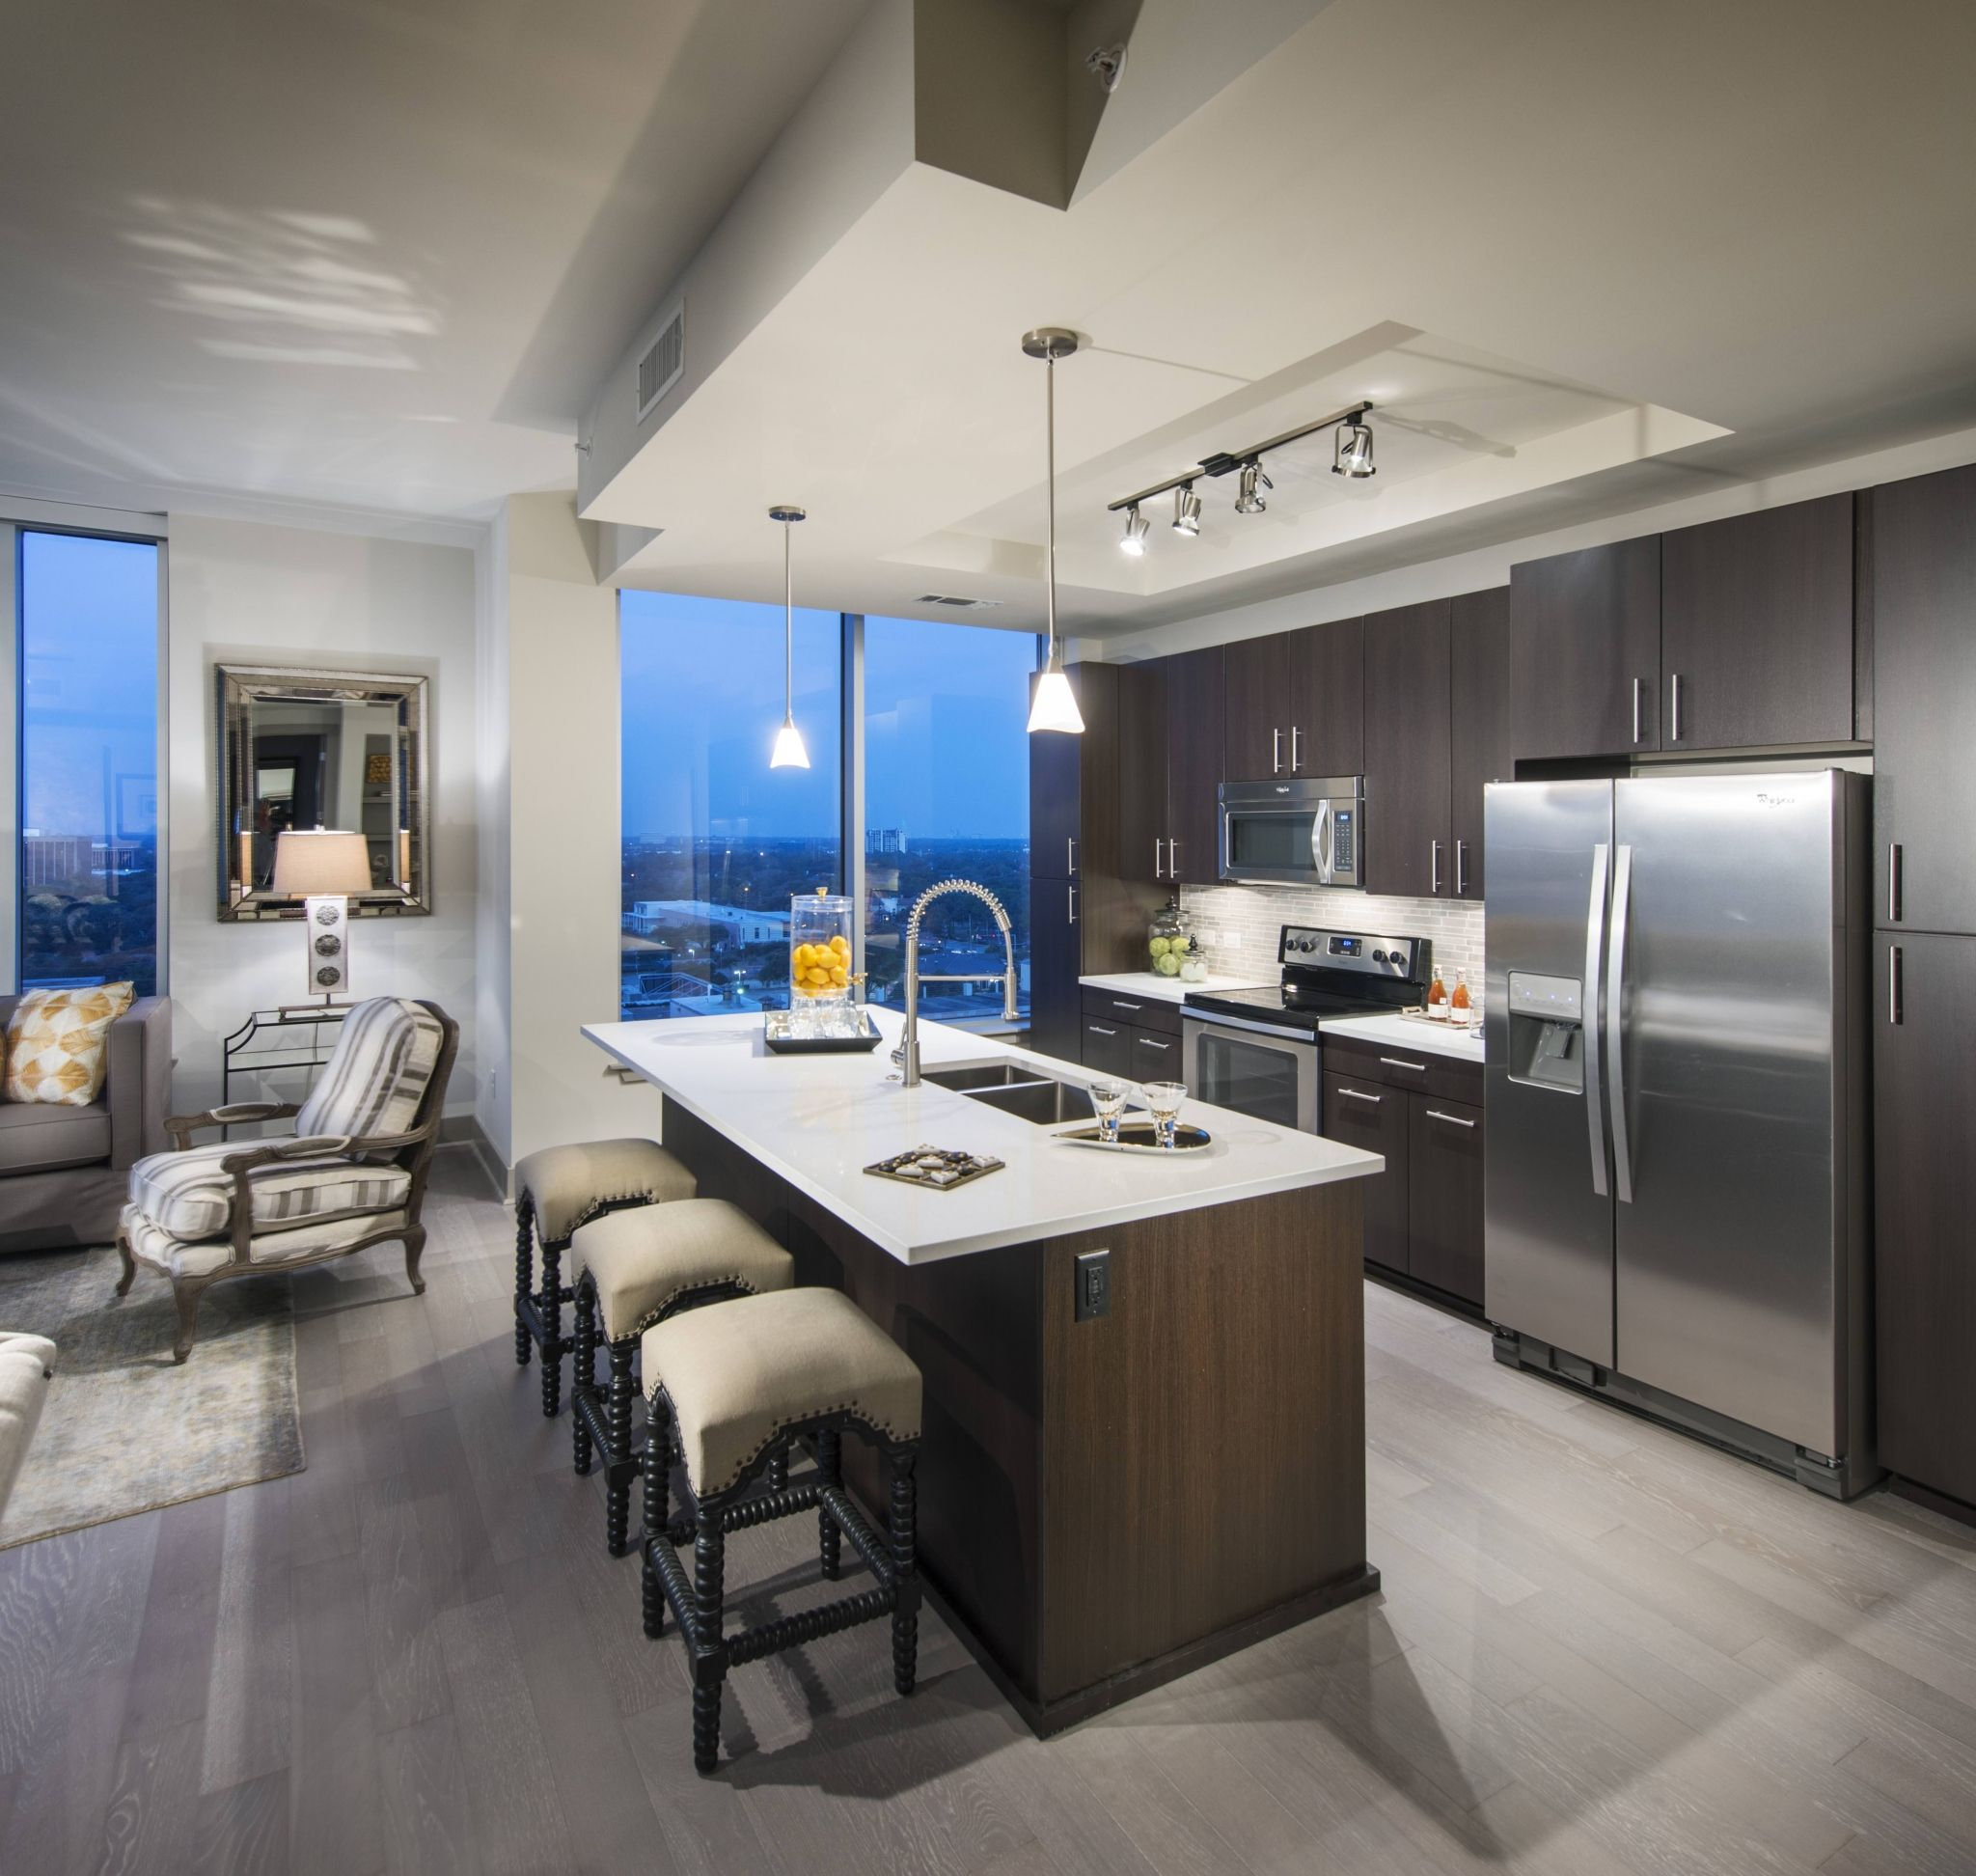 Hanover Post Oak ǀ Gallery ǀ Houston High Rise Apartments Houston Apartment Houston Luxury Luxury Apartments